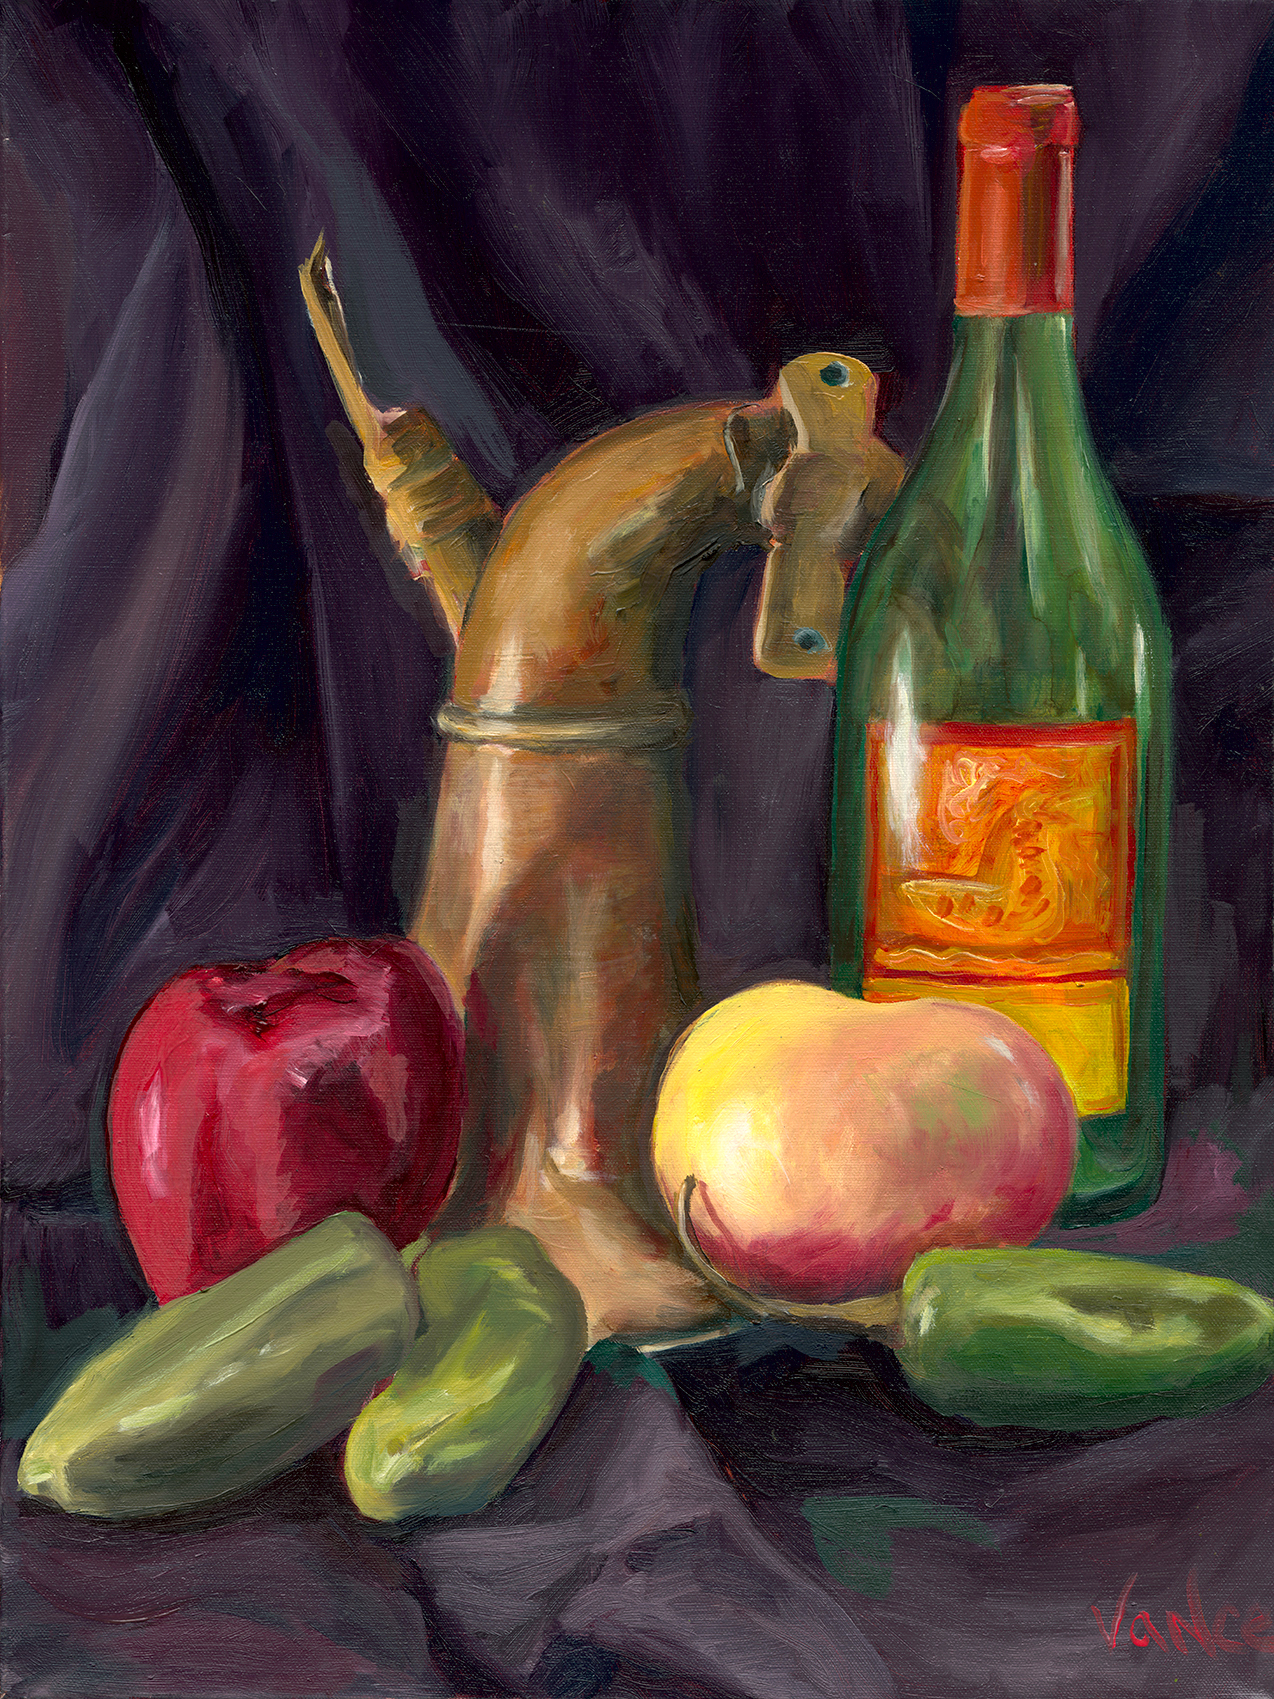 Opv art still life produce bottle and horn low res jpg file ry1kfy